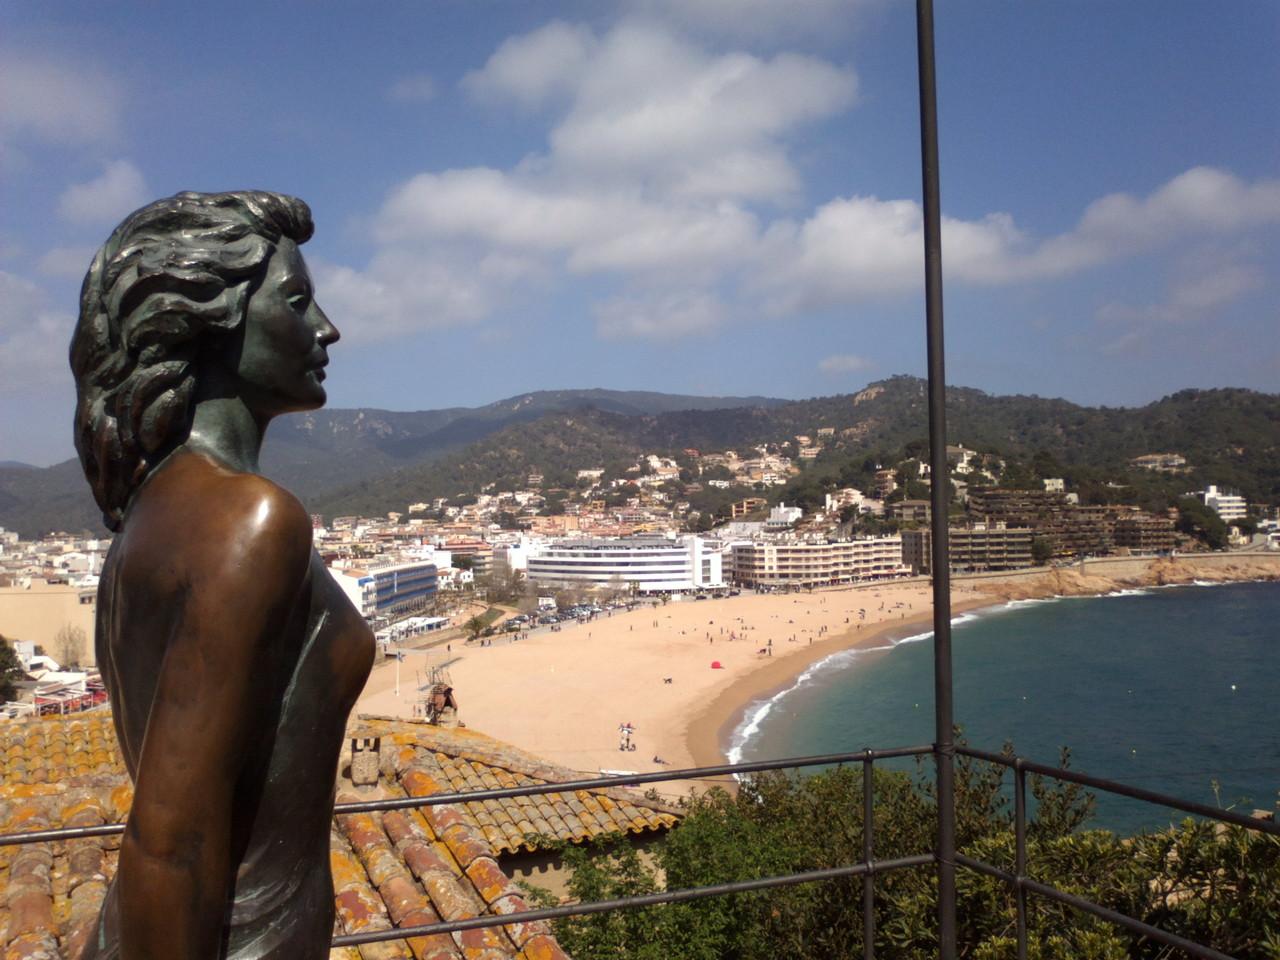 Estatua de Ava Gardner en Tossa de Mar